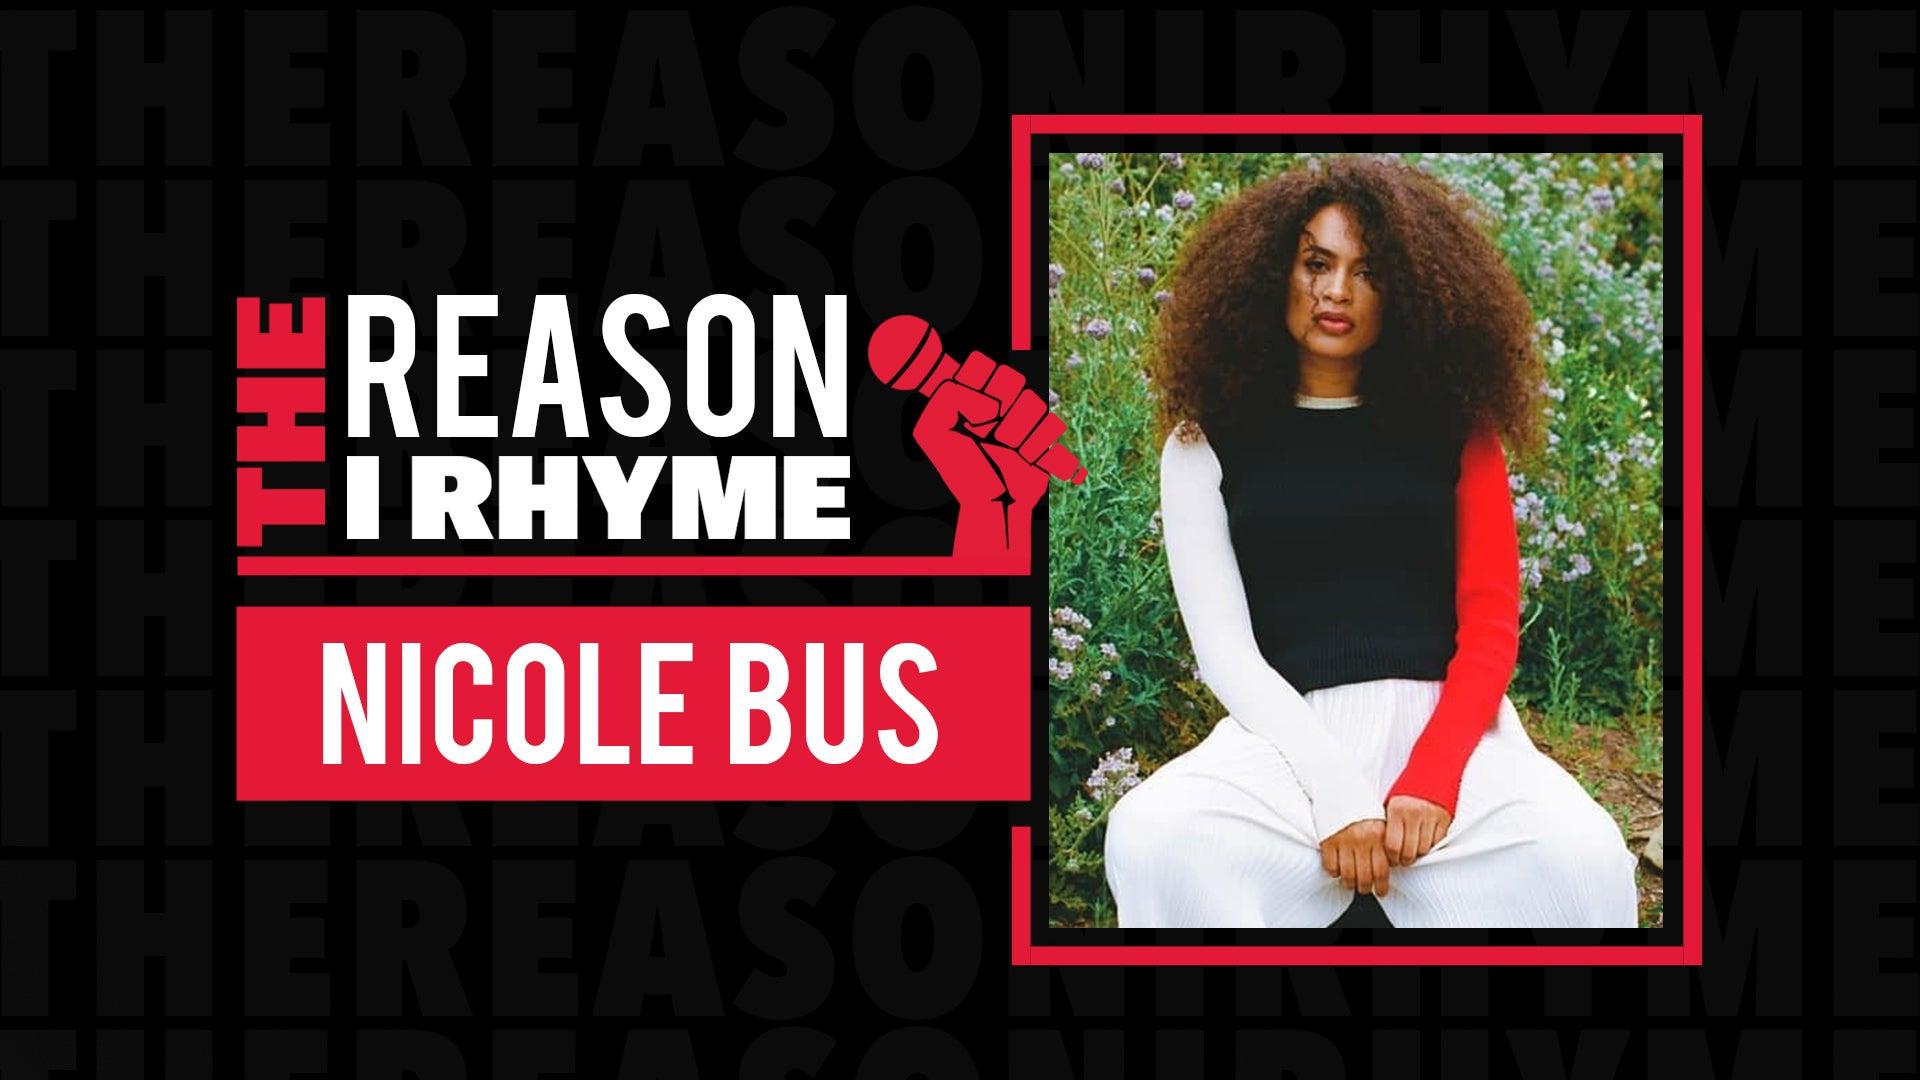 The Reason I Rhyme: Nicole Bus